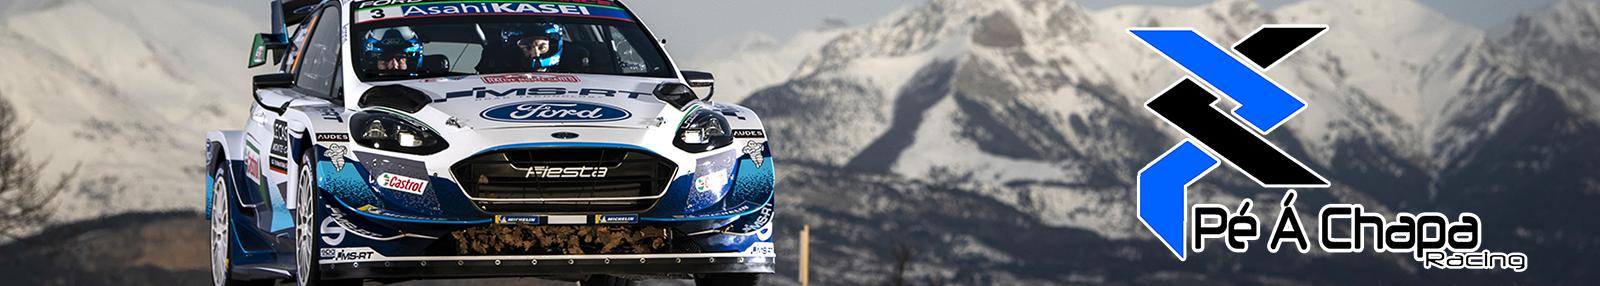 World Rally Championship: Temporada 2021  - Página 26 Prueba%2B2